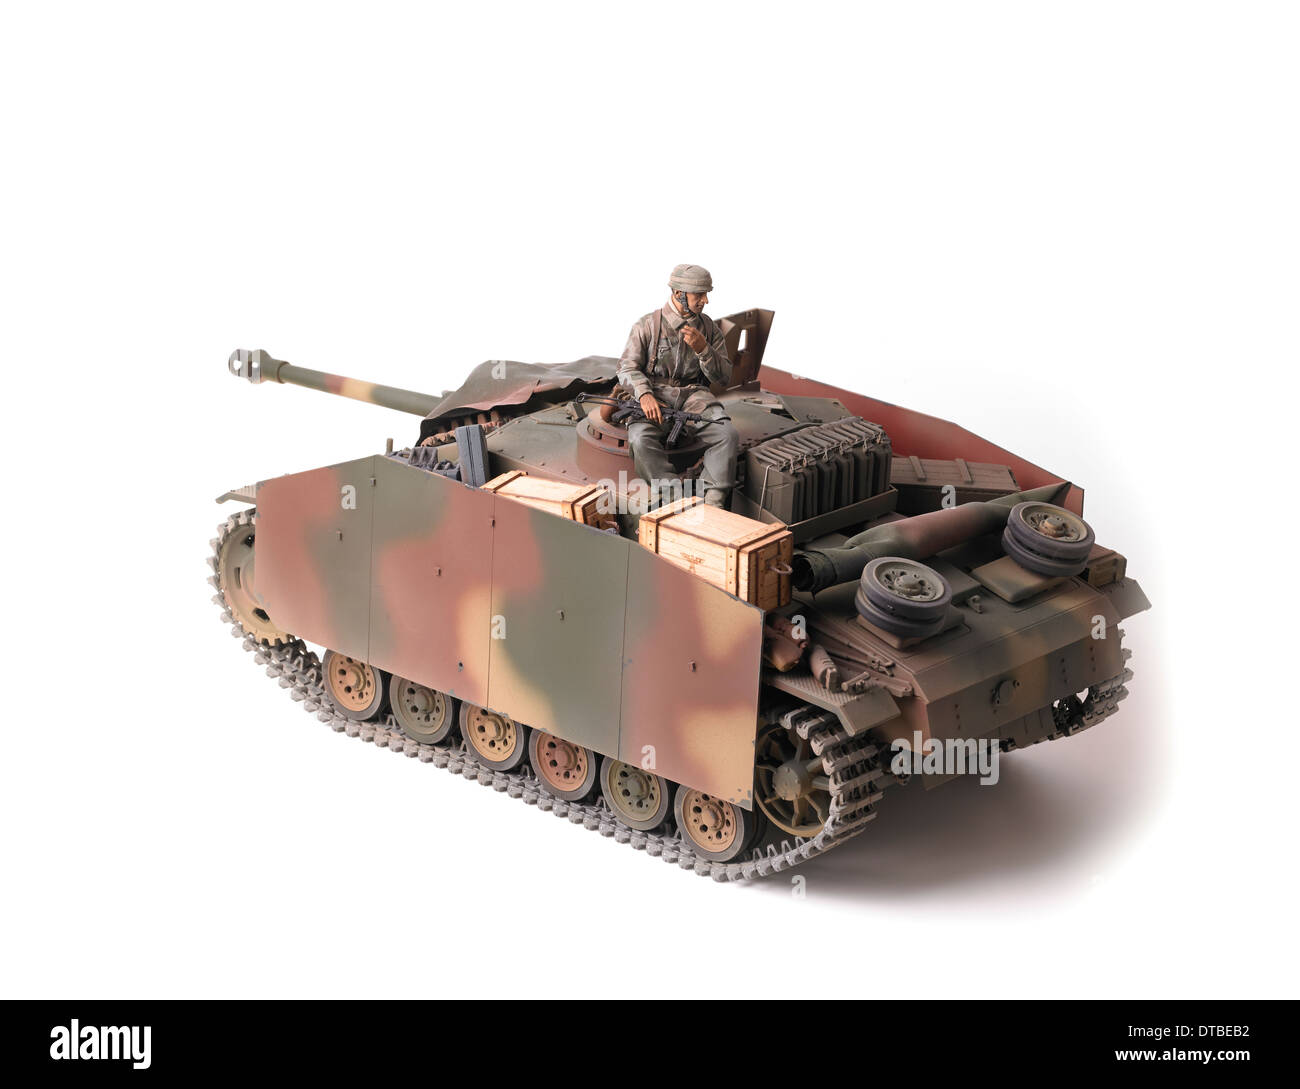 Sturmgeschütz III assault gun in German WW2 European theatre camouflage with Schürzen side skirts - Stock Image